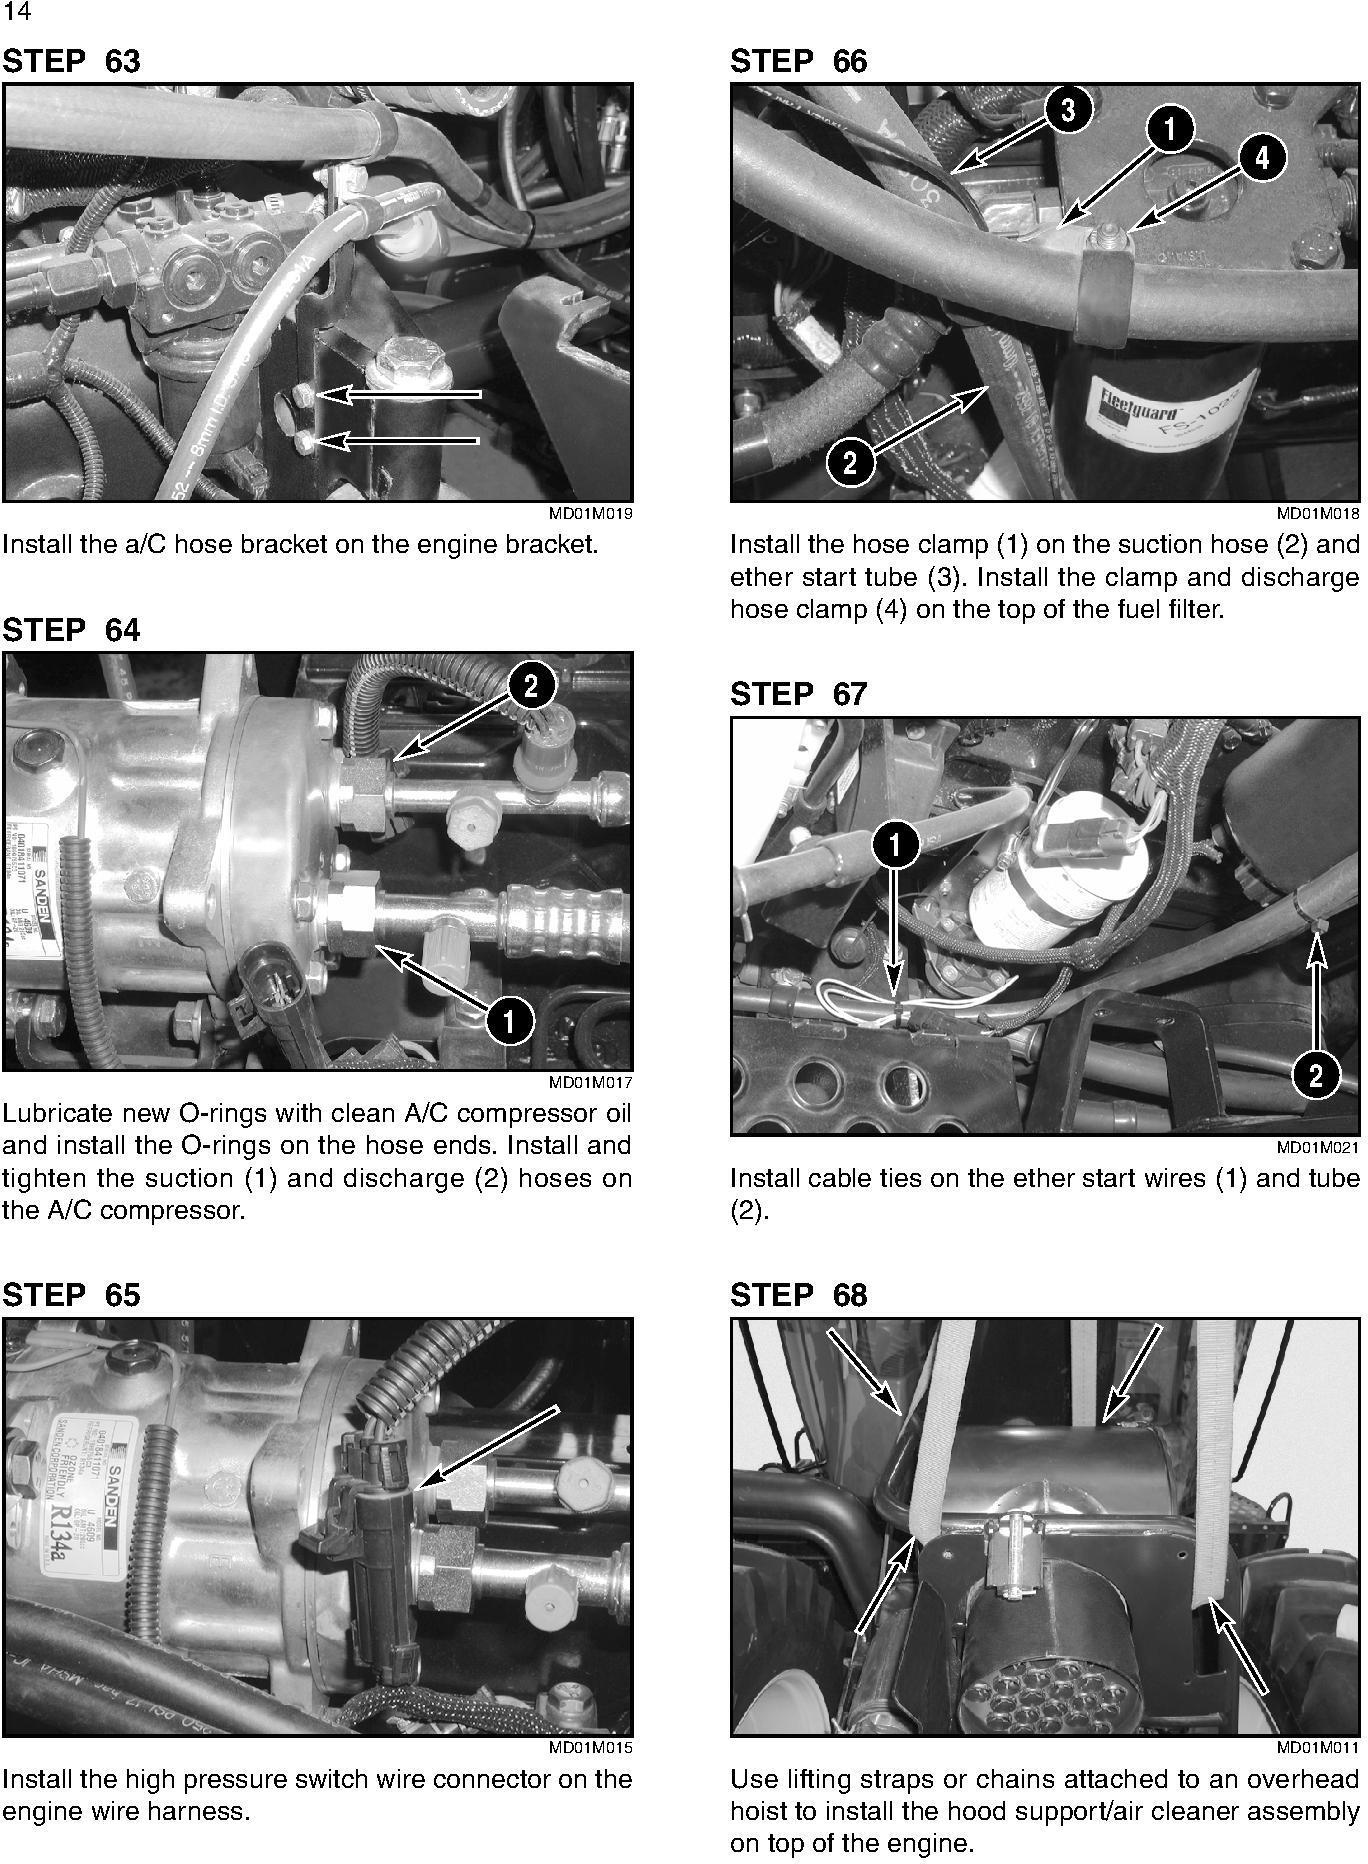 New Holland TJ275, TJ325, TJ375, TJ425, TJ450, TJ500 Tractors Complete Service Manual - 1